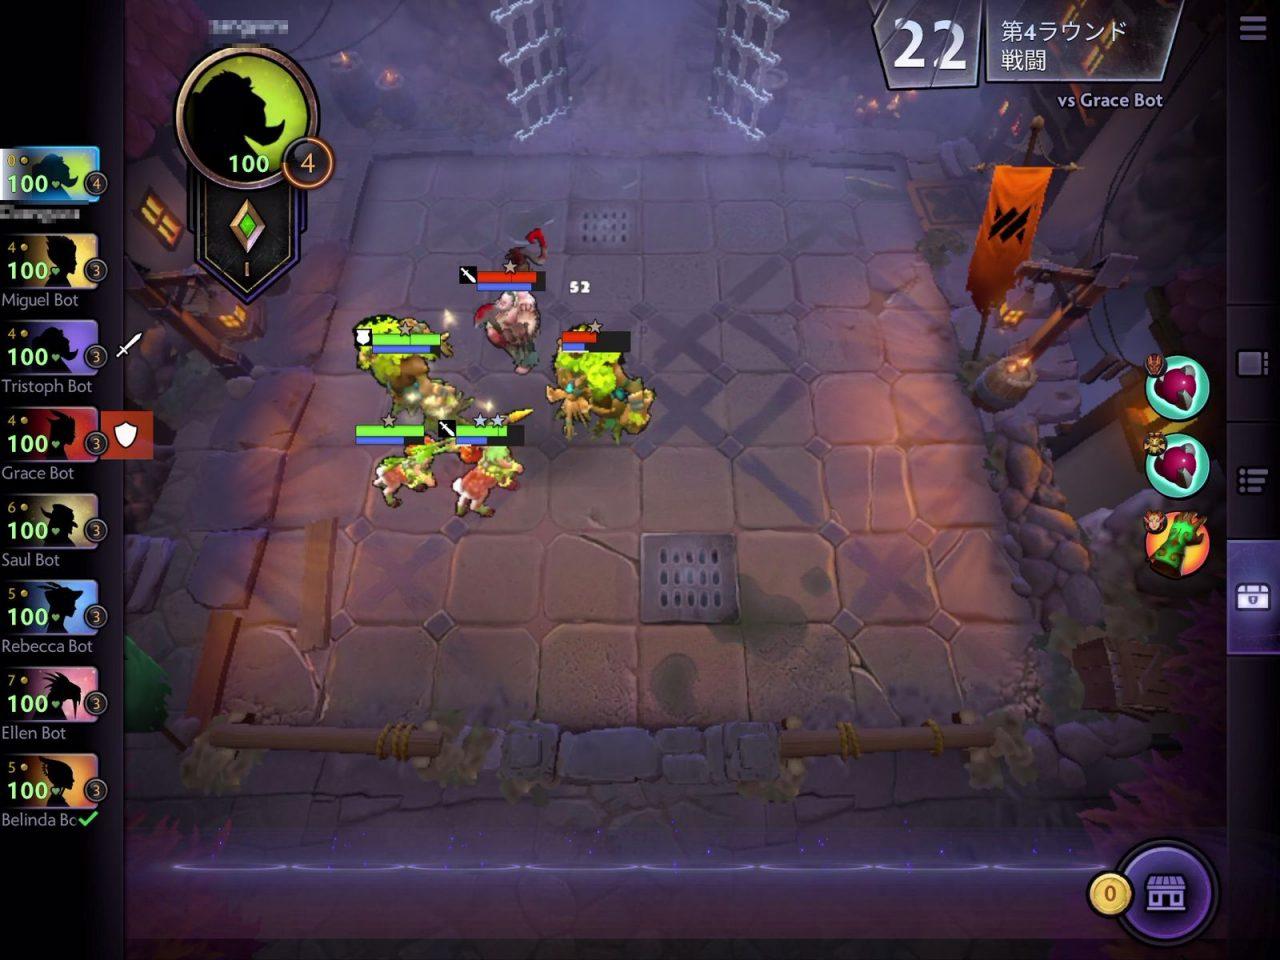 Dota Underlords攻略:白熱の頭脳戦!ゲームの魅力を徹底解説!